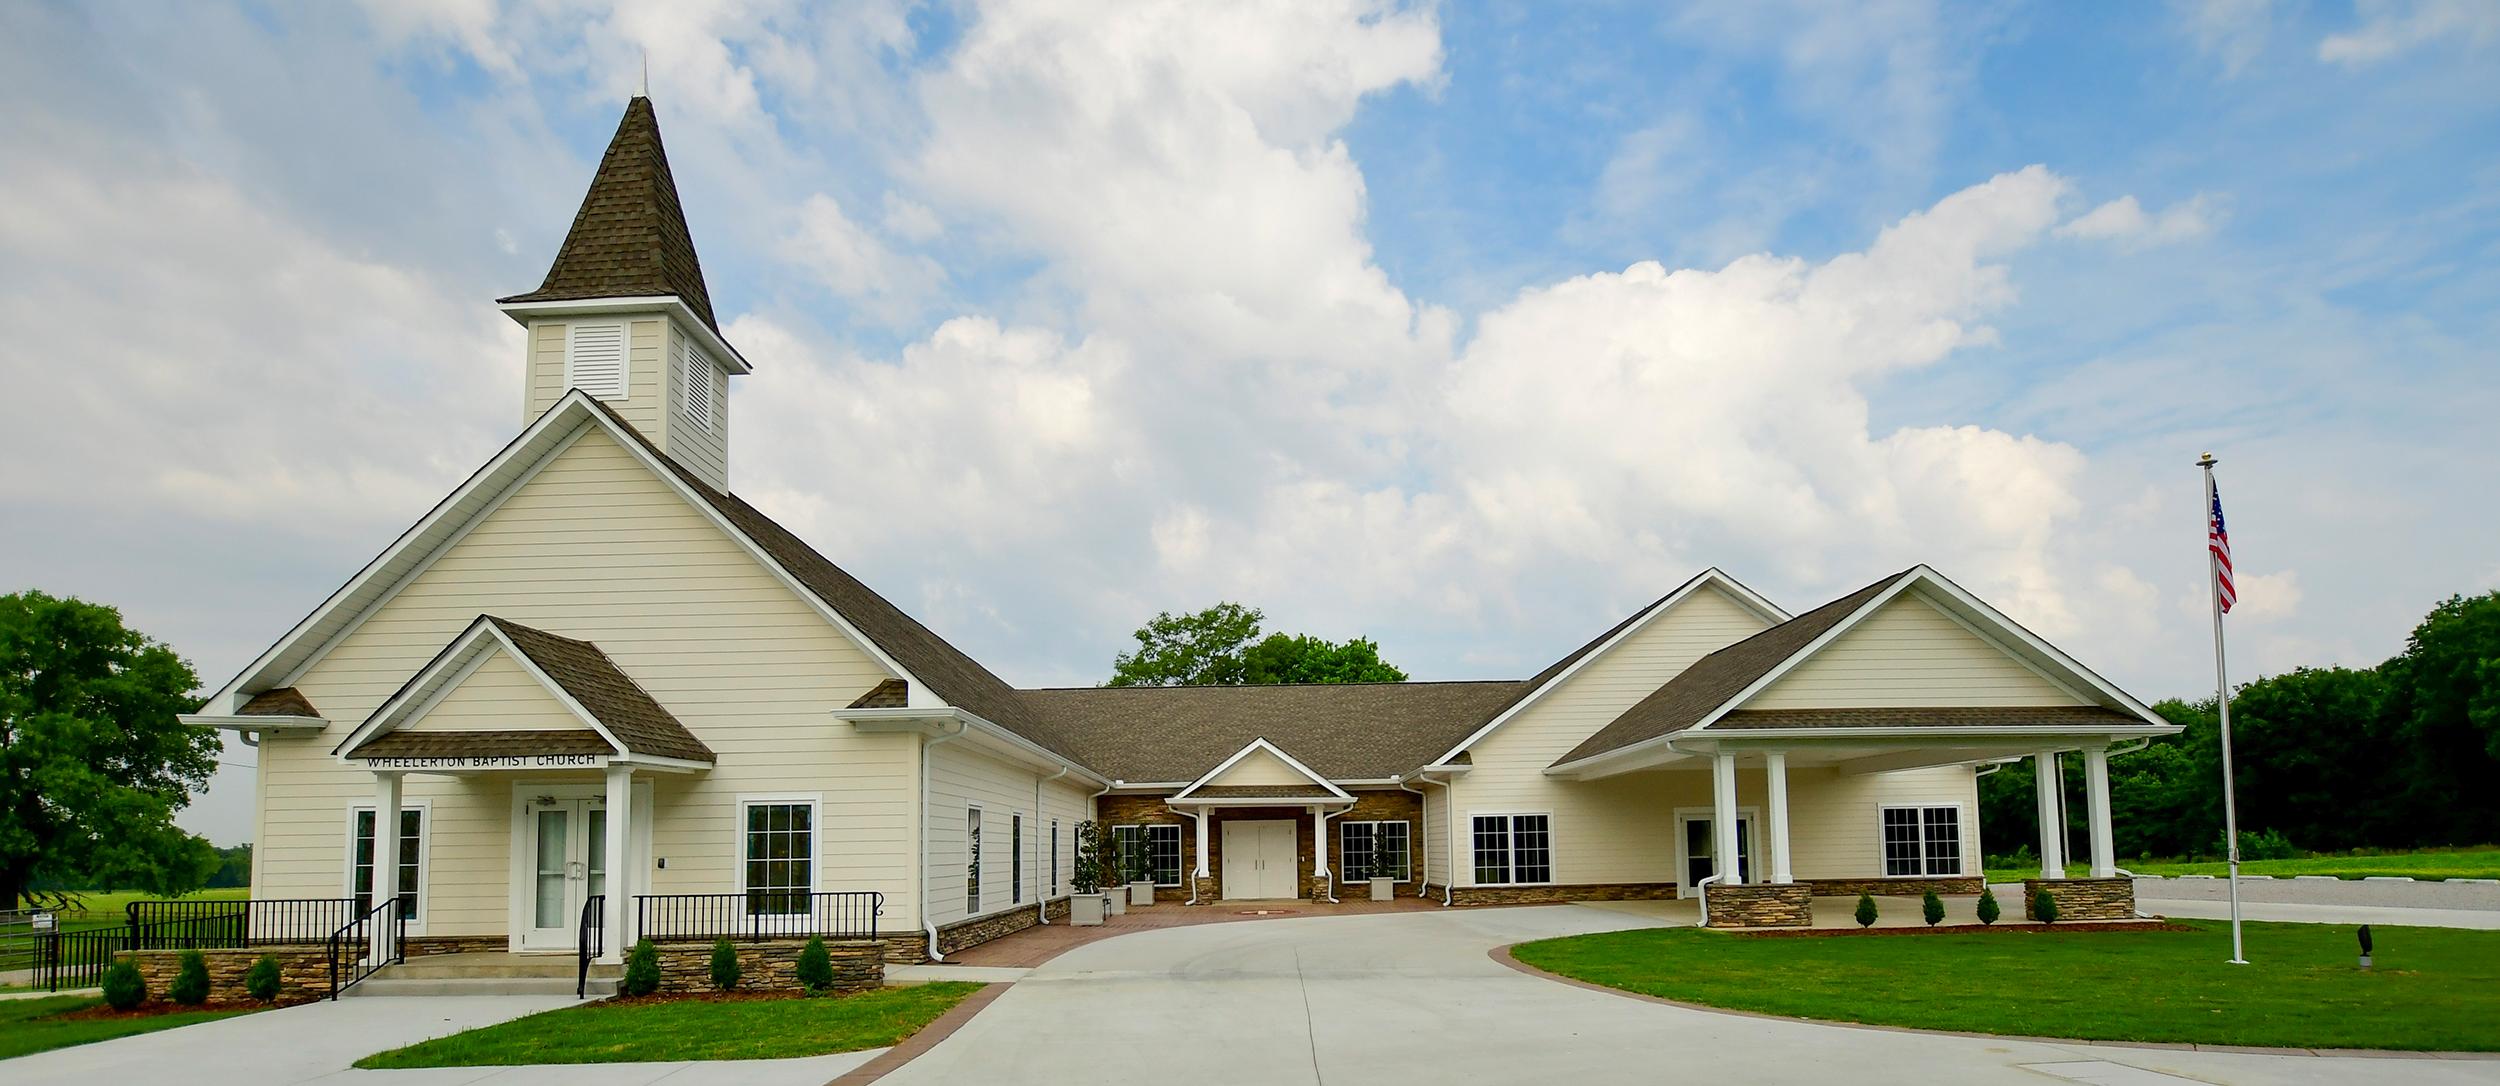 Wheelerton Baptist Church | Dellrose, Tennesee | Brindley Construction